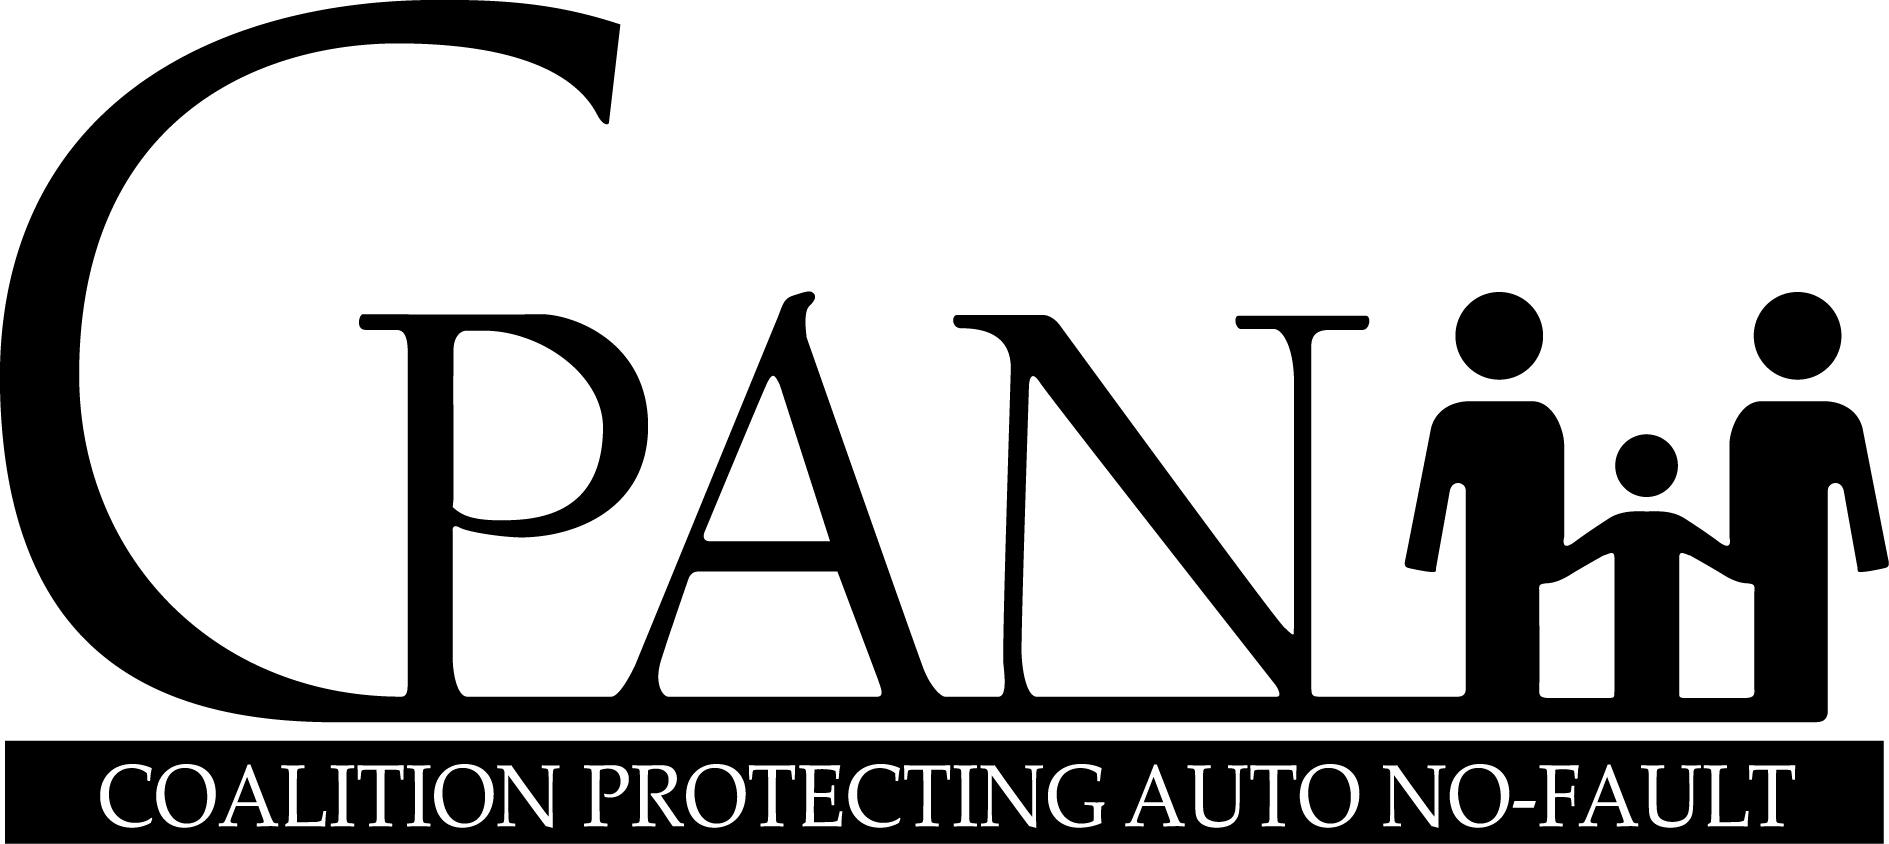 CPAN logo_HighRes.jpg